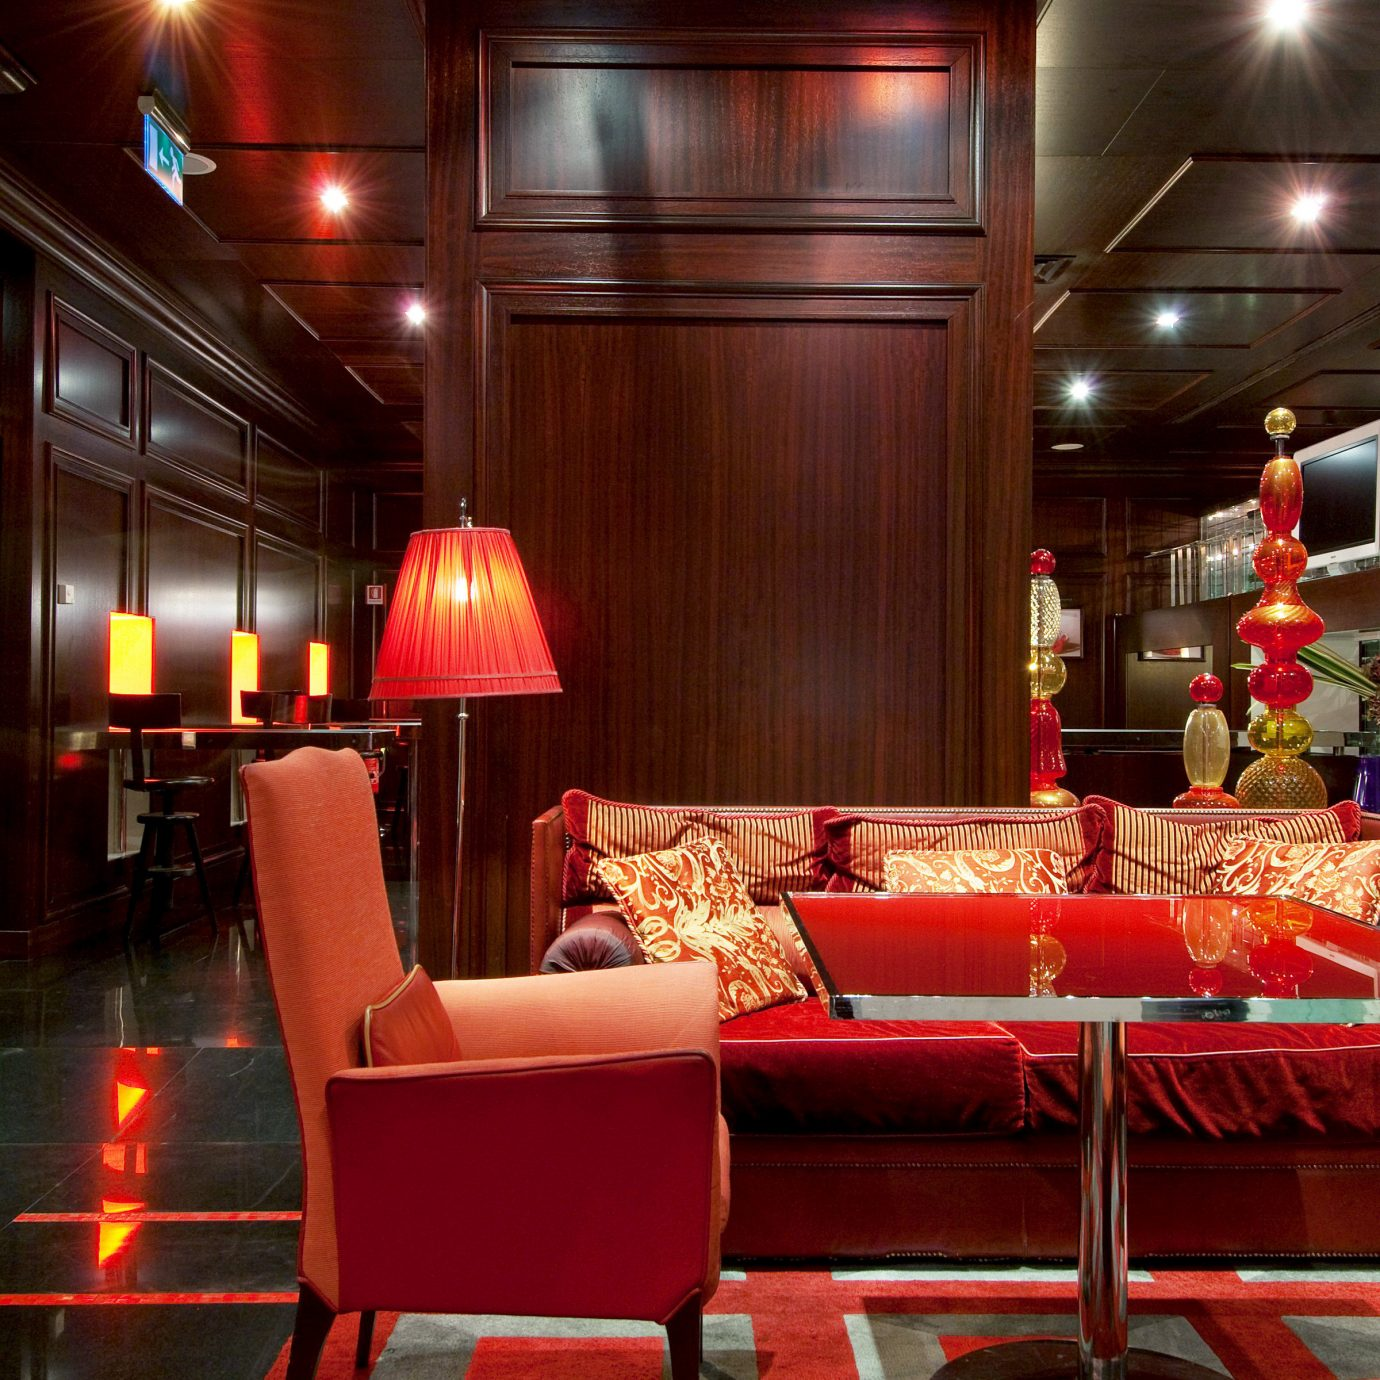 Bar Dining Drink Eat Elegant Hip Luxury Modern Nightlife red Lobby restaurant function hall nightclub light theatre movie theater